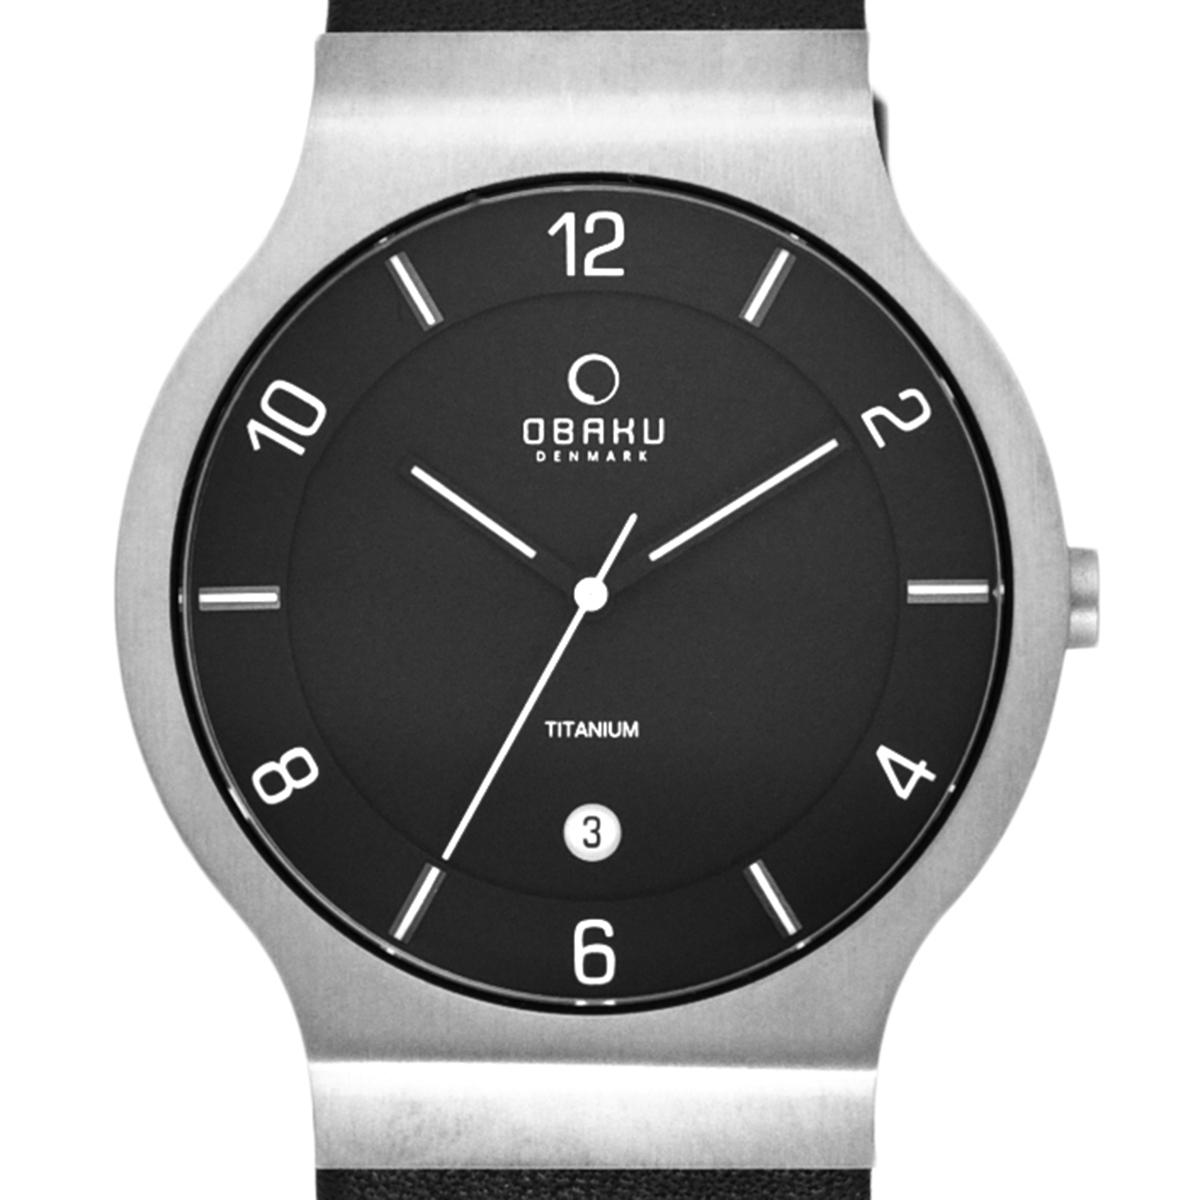 OBAKU オバック クォーツ 腕時計 デンマーク シンプル 薄型 ファッション [V133XTBRB1] 並行輸入品 純正ケース メーカー保証